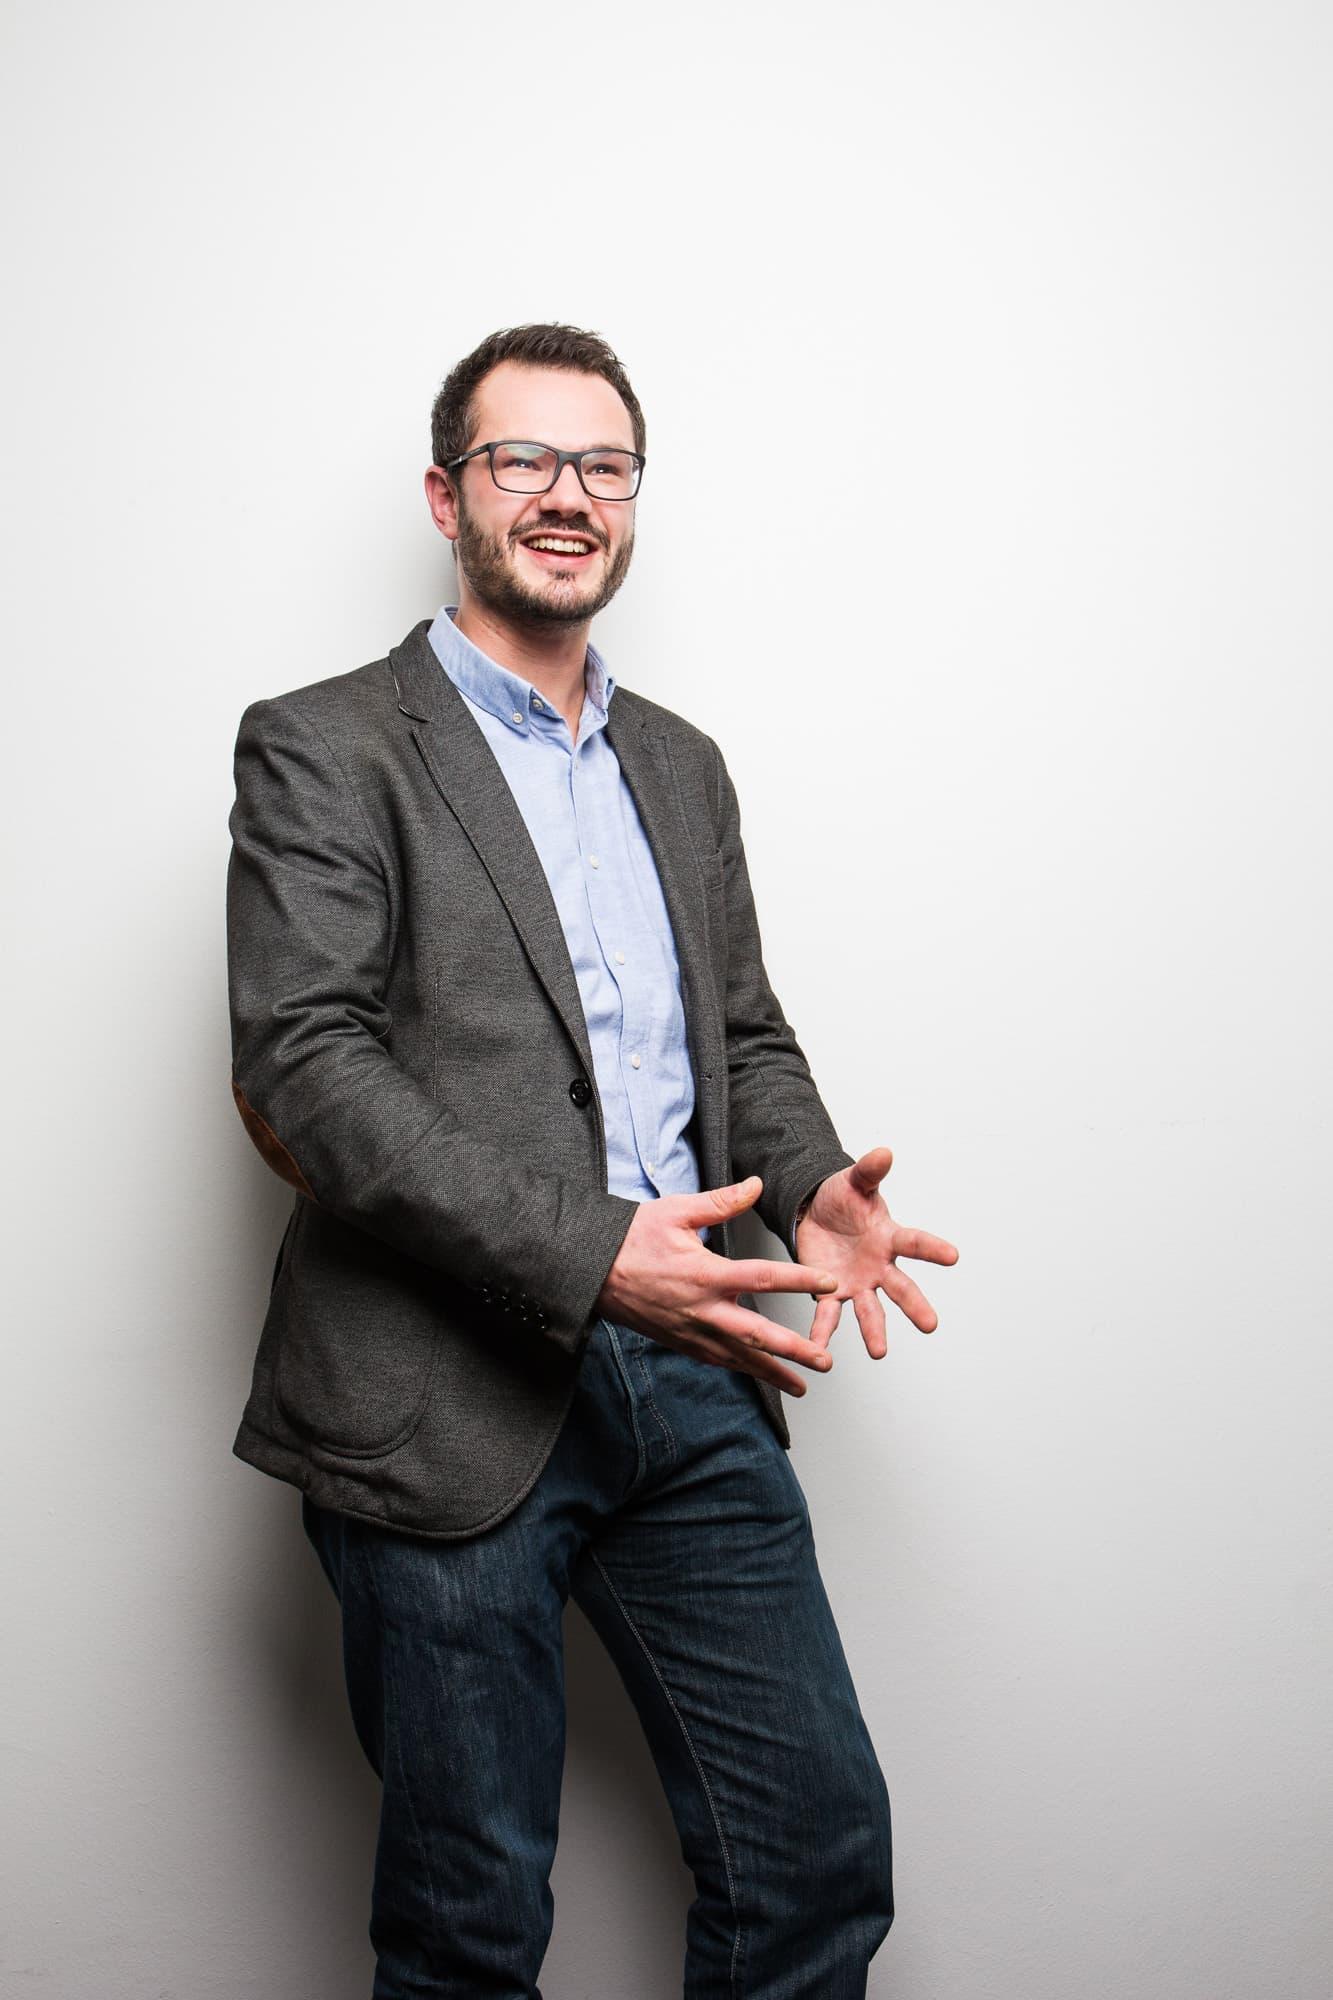 Prof. Robert Böhm gestikuliert vor weißer Wand